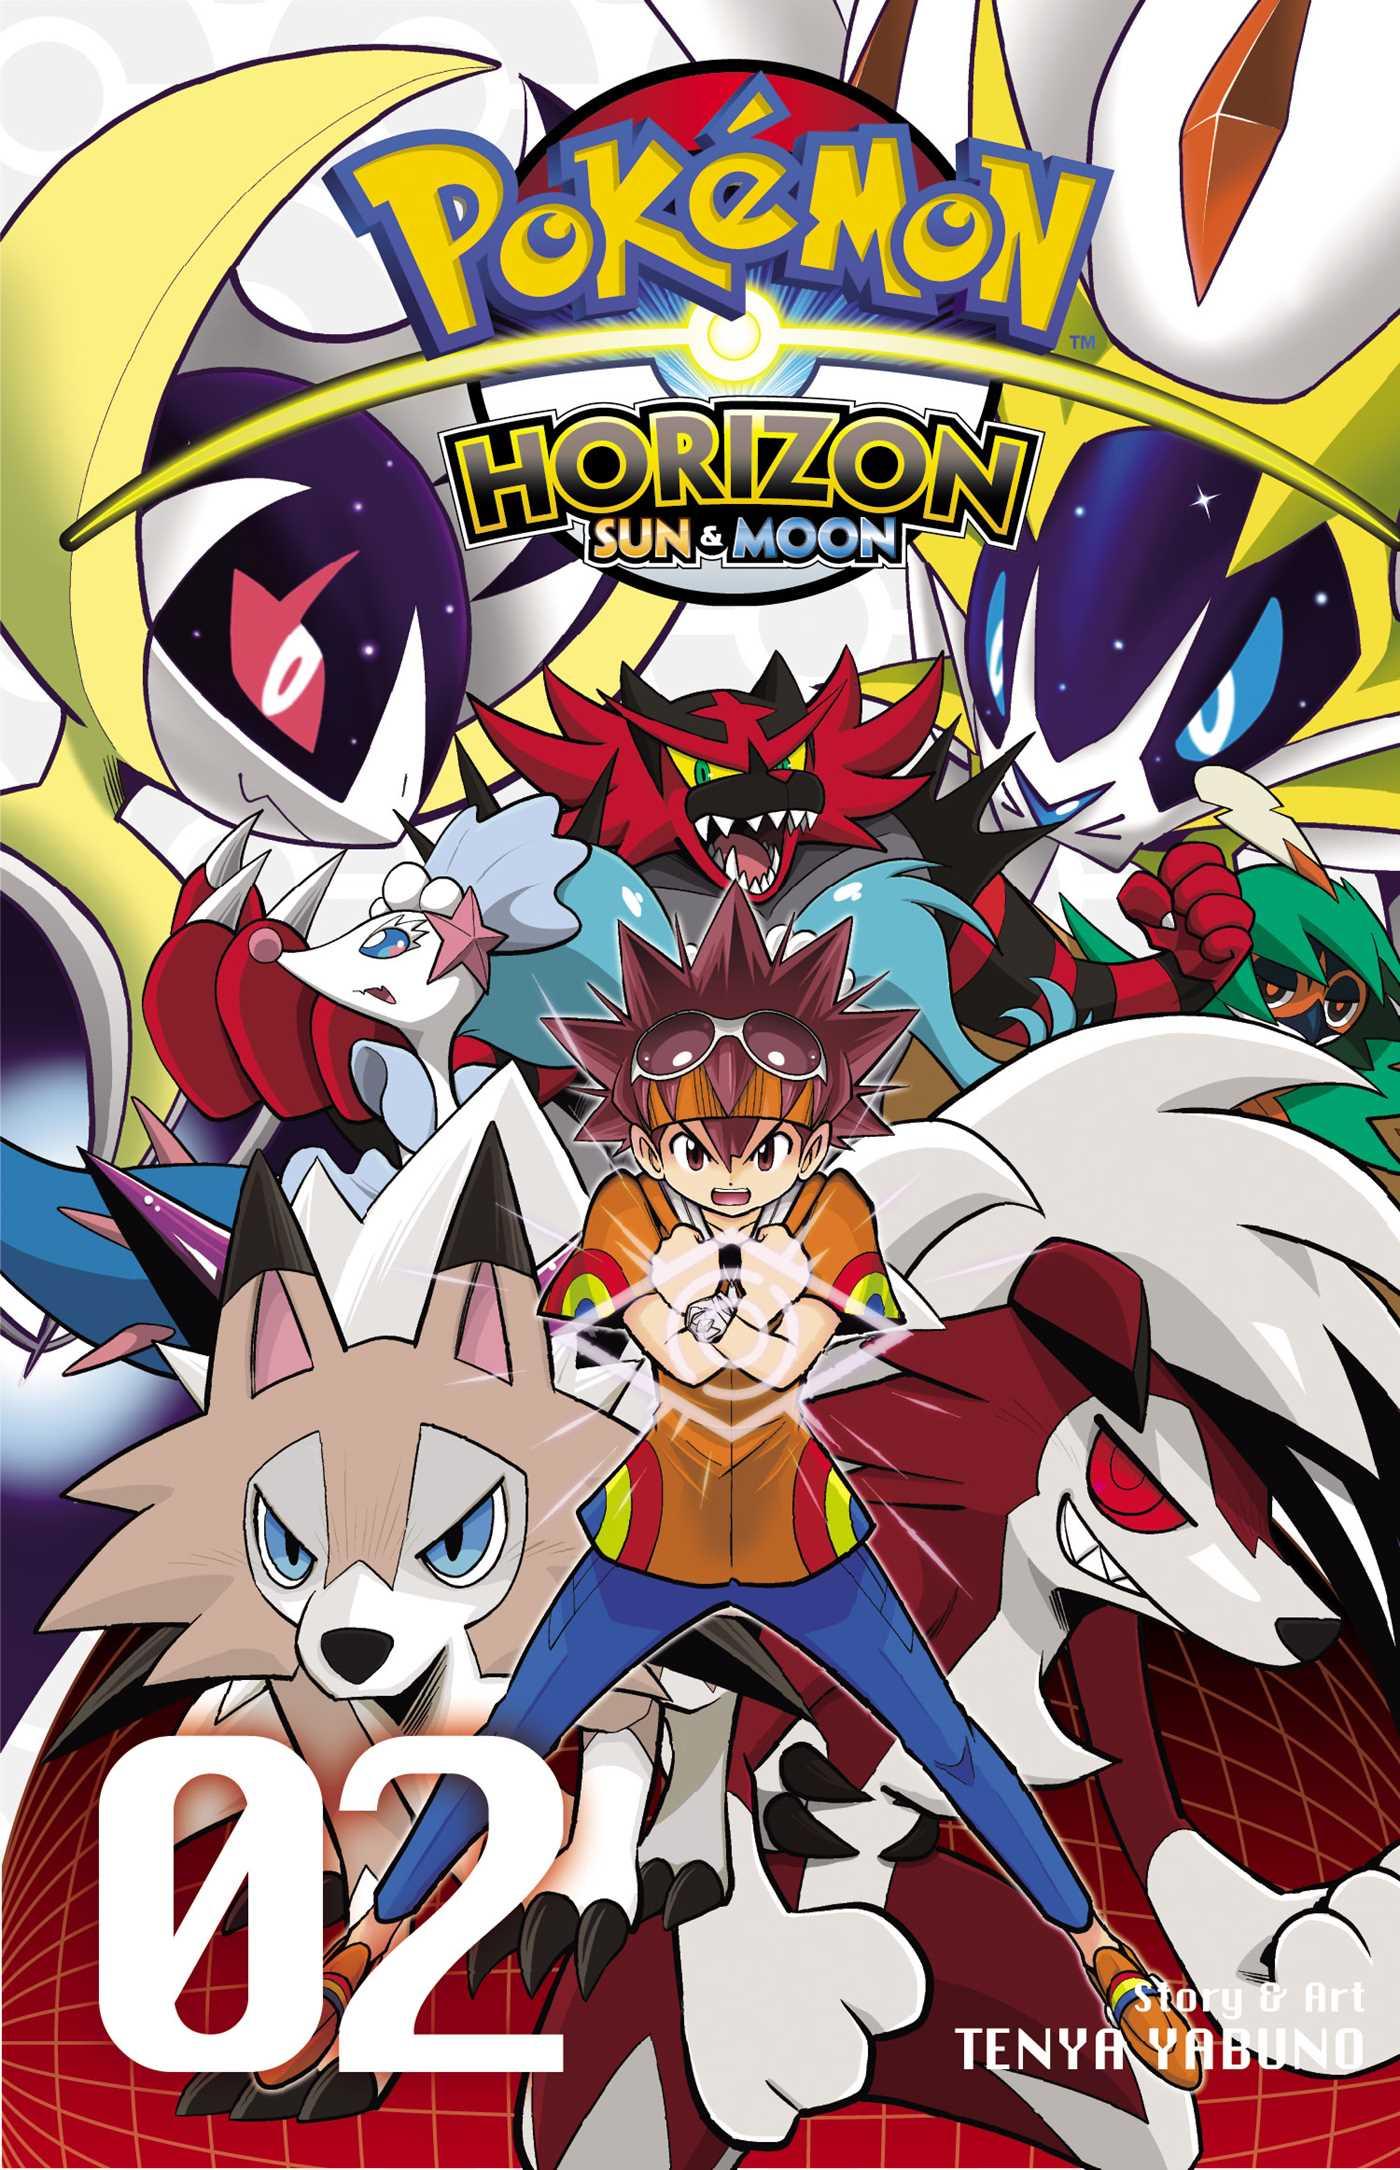 pokémon horizon: sun & moon, vol. 2 | book by tenya yabuno